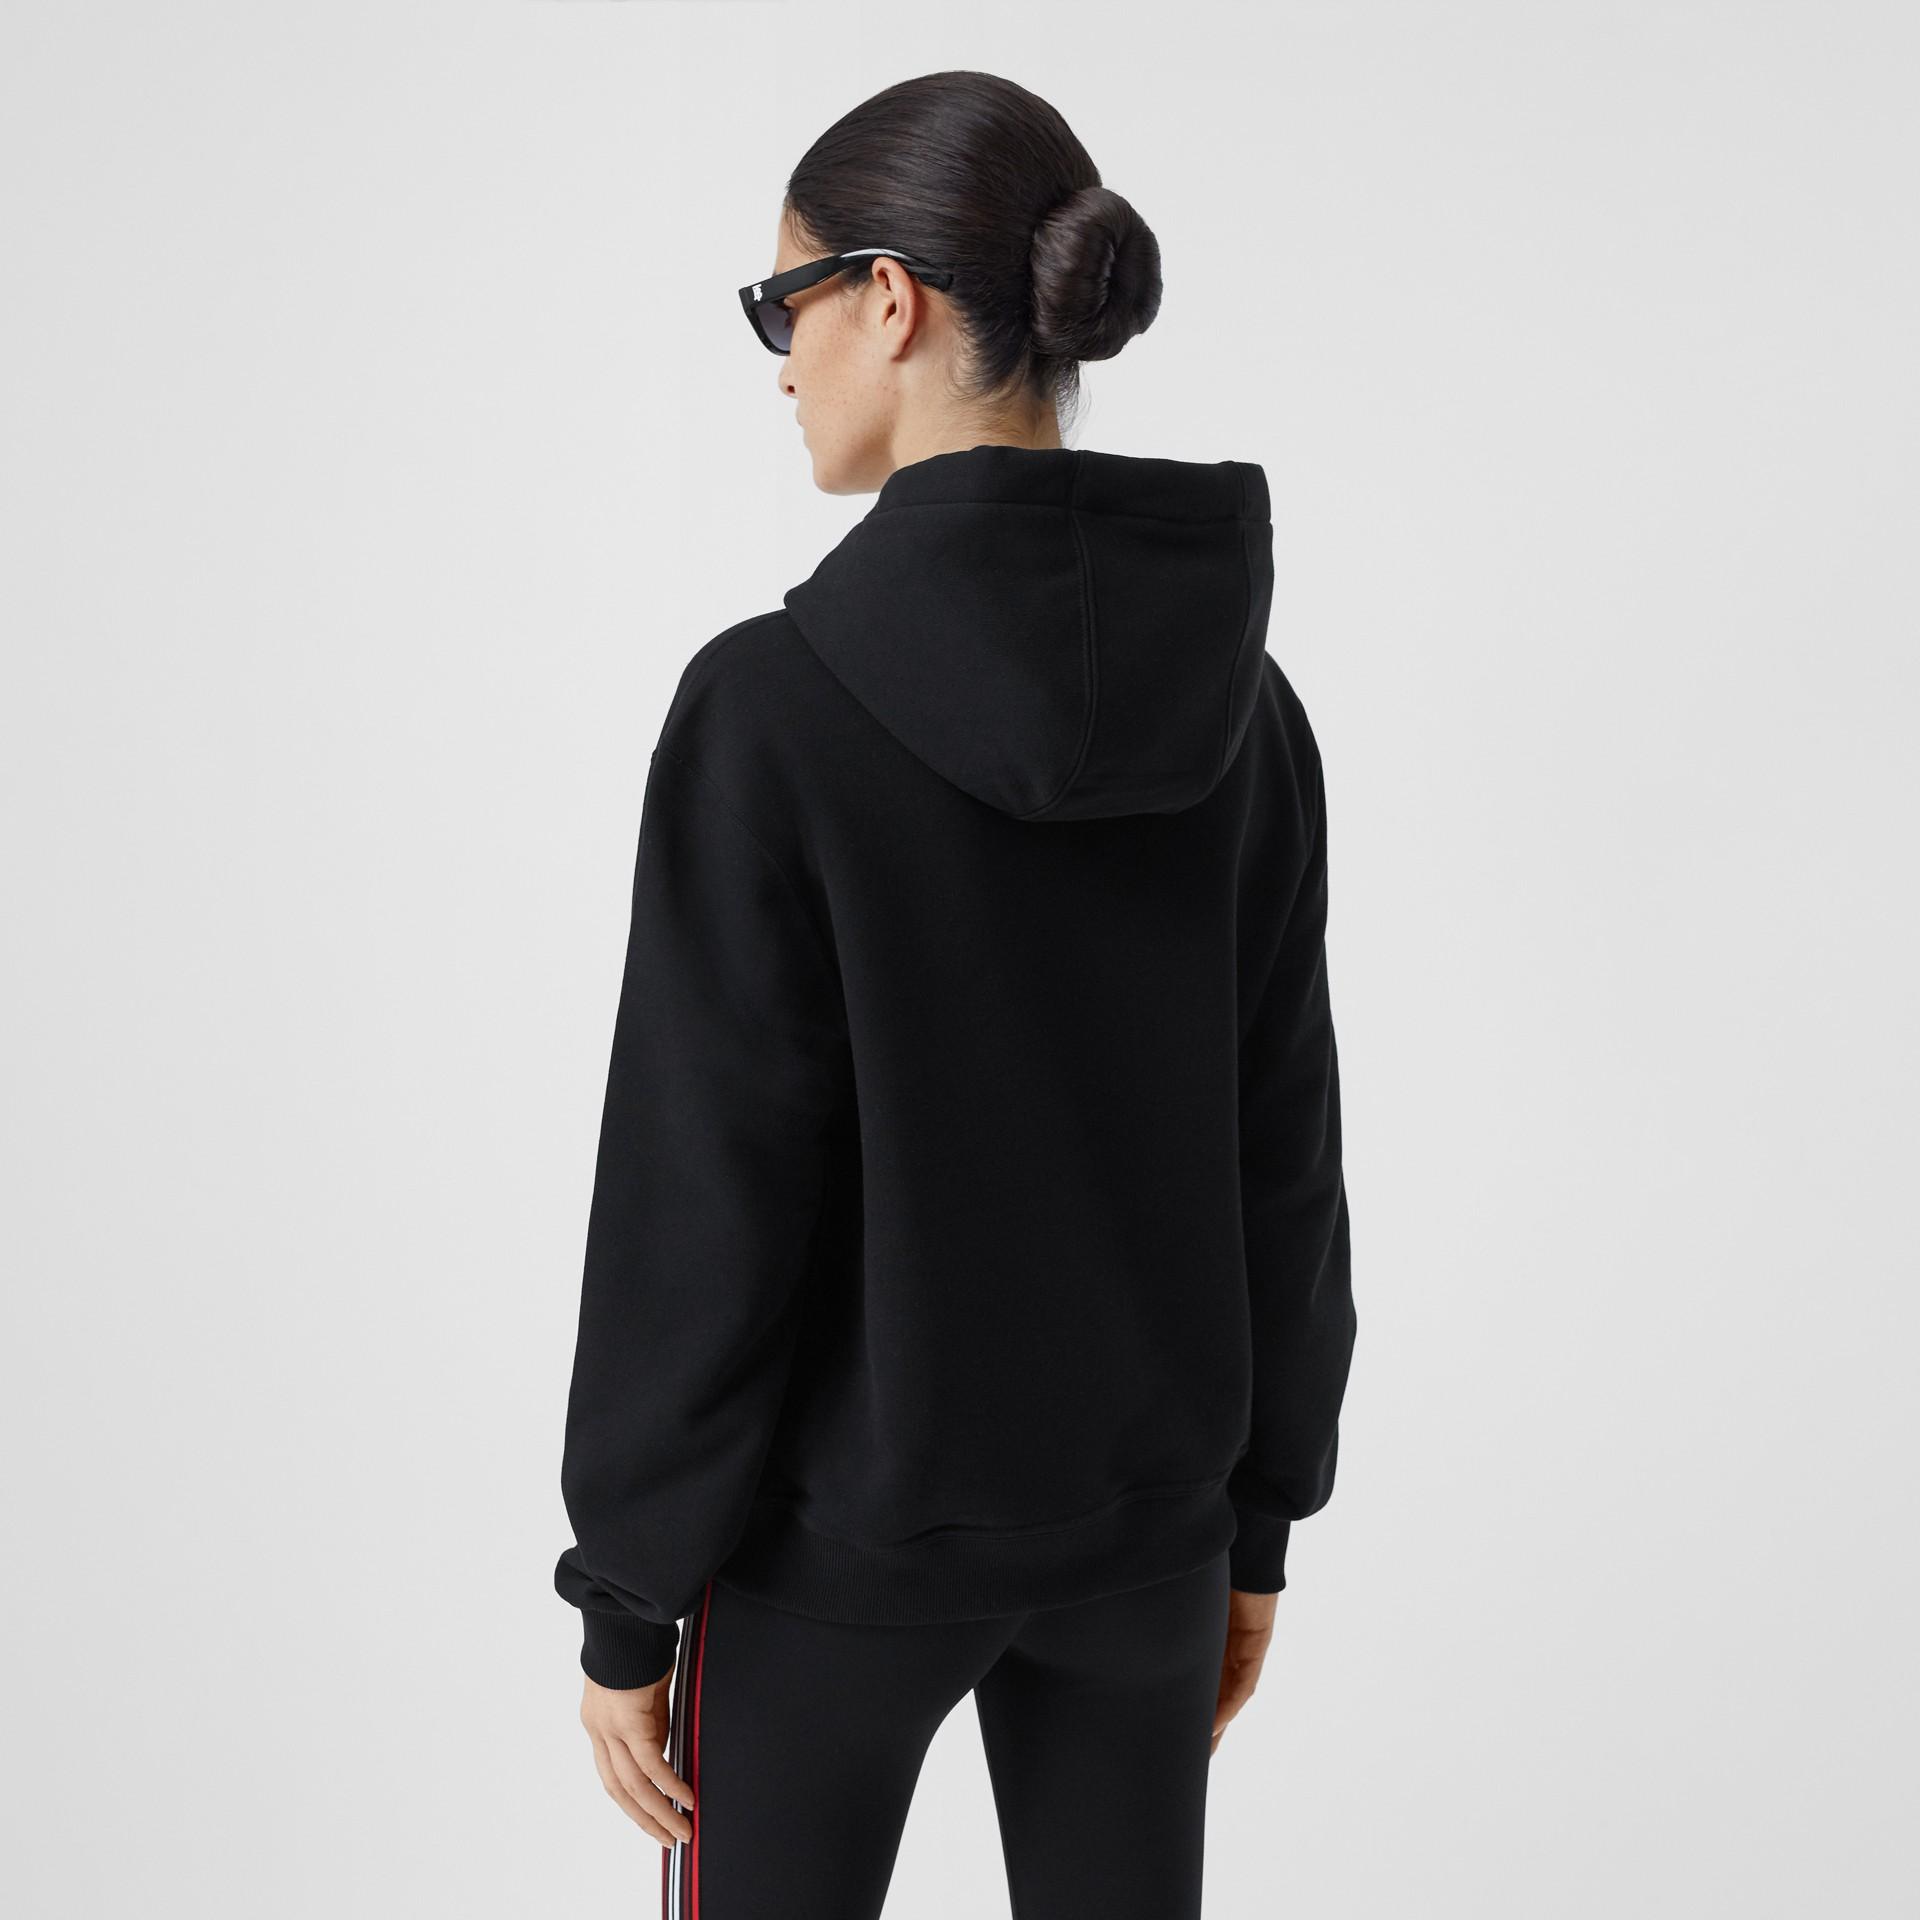 Monogram Motif Cotton Hoodie in Black - Women | Burberry - gallery image 2